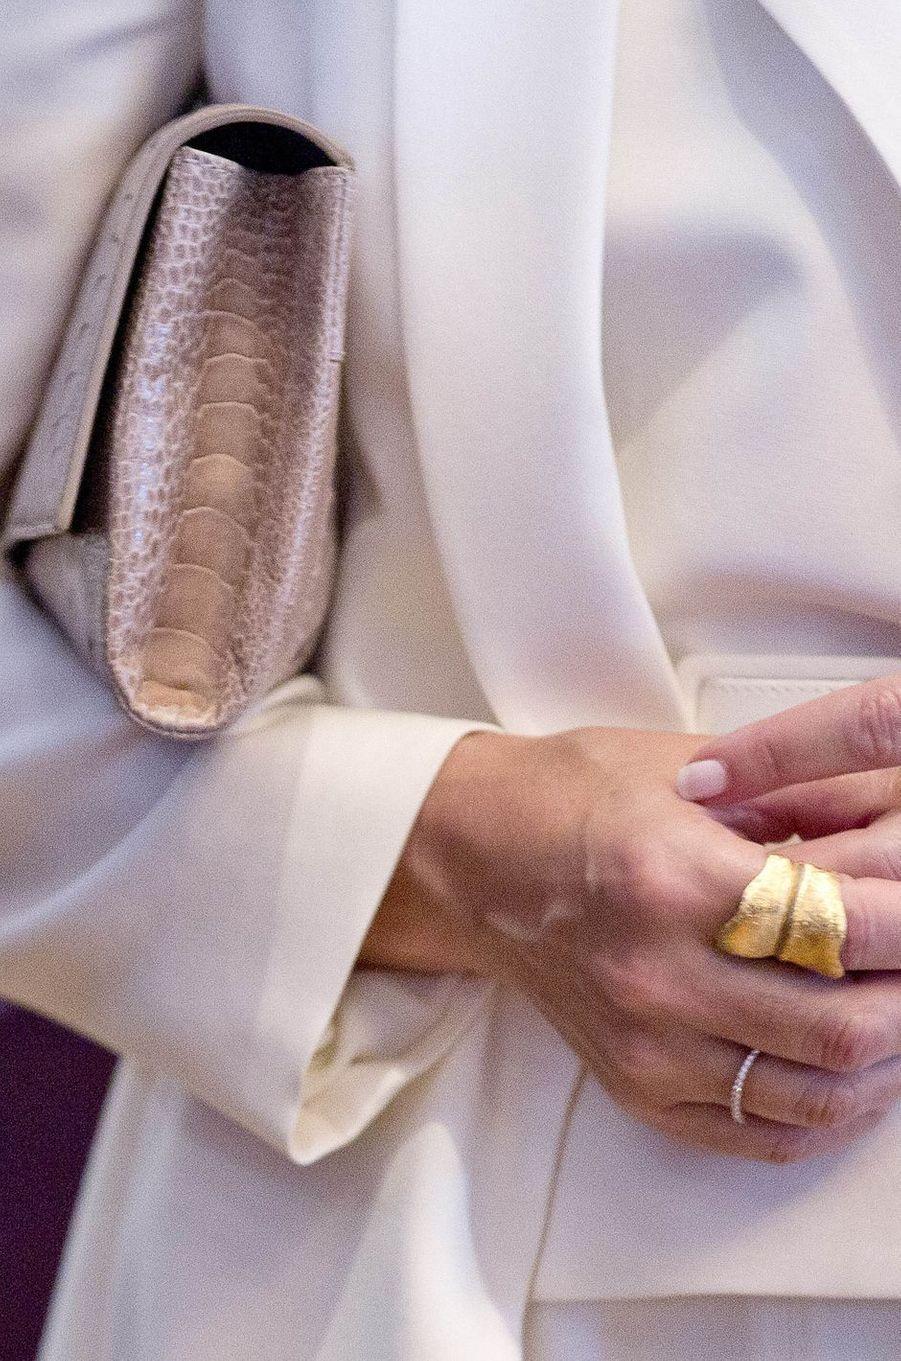 La bague de la princesse Mary de Danemark le 29 mai 2017